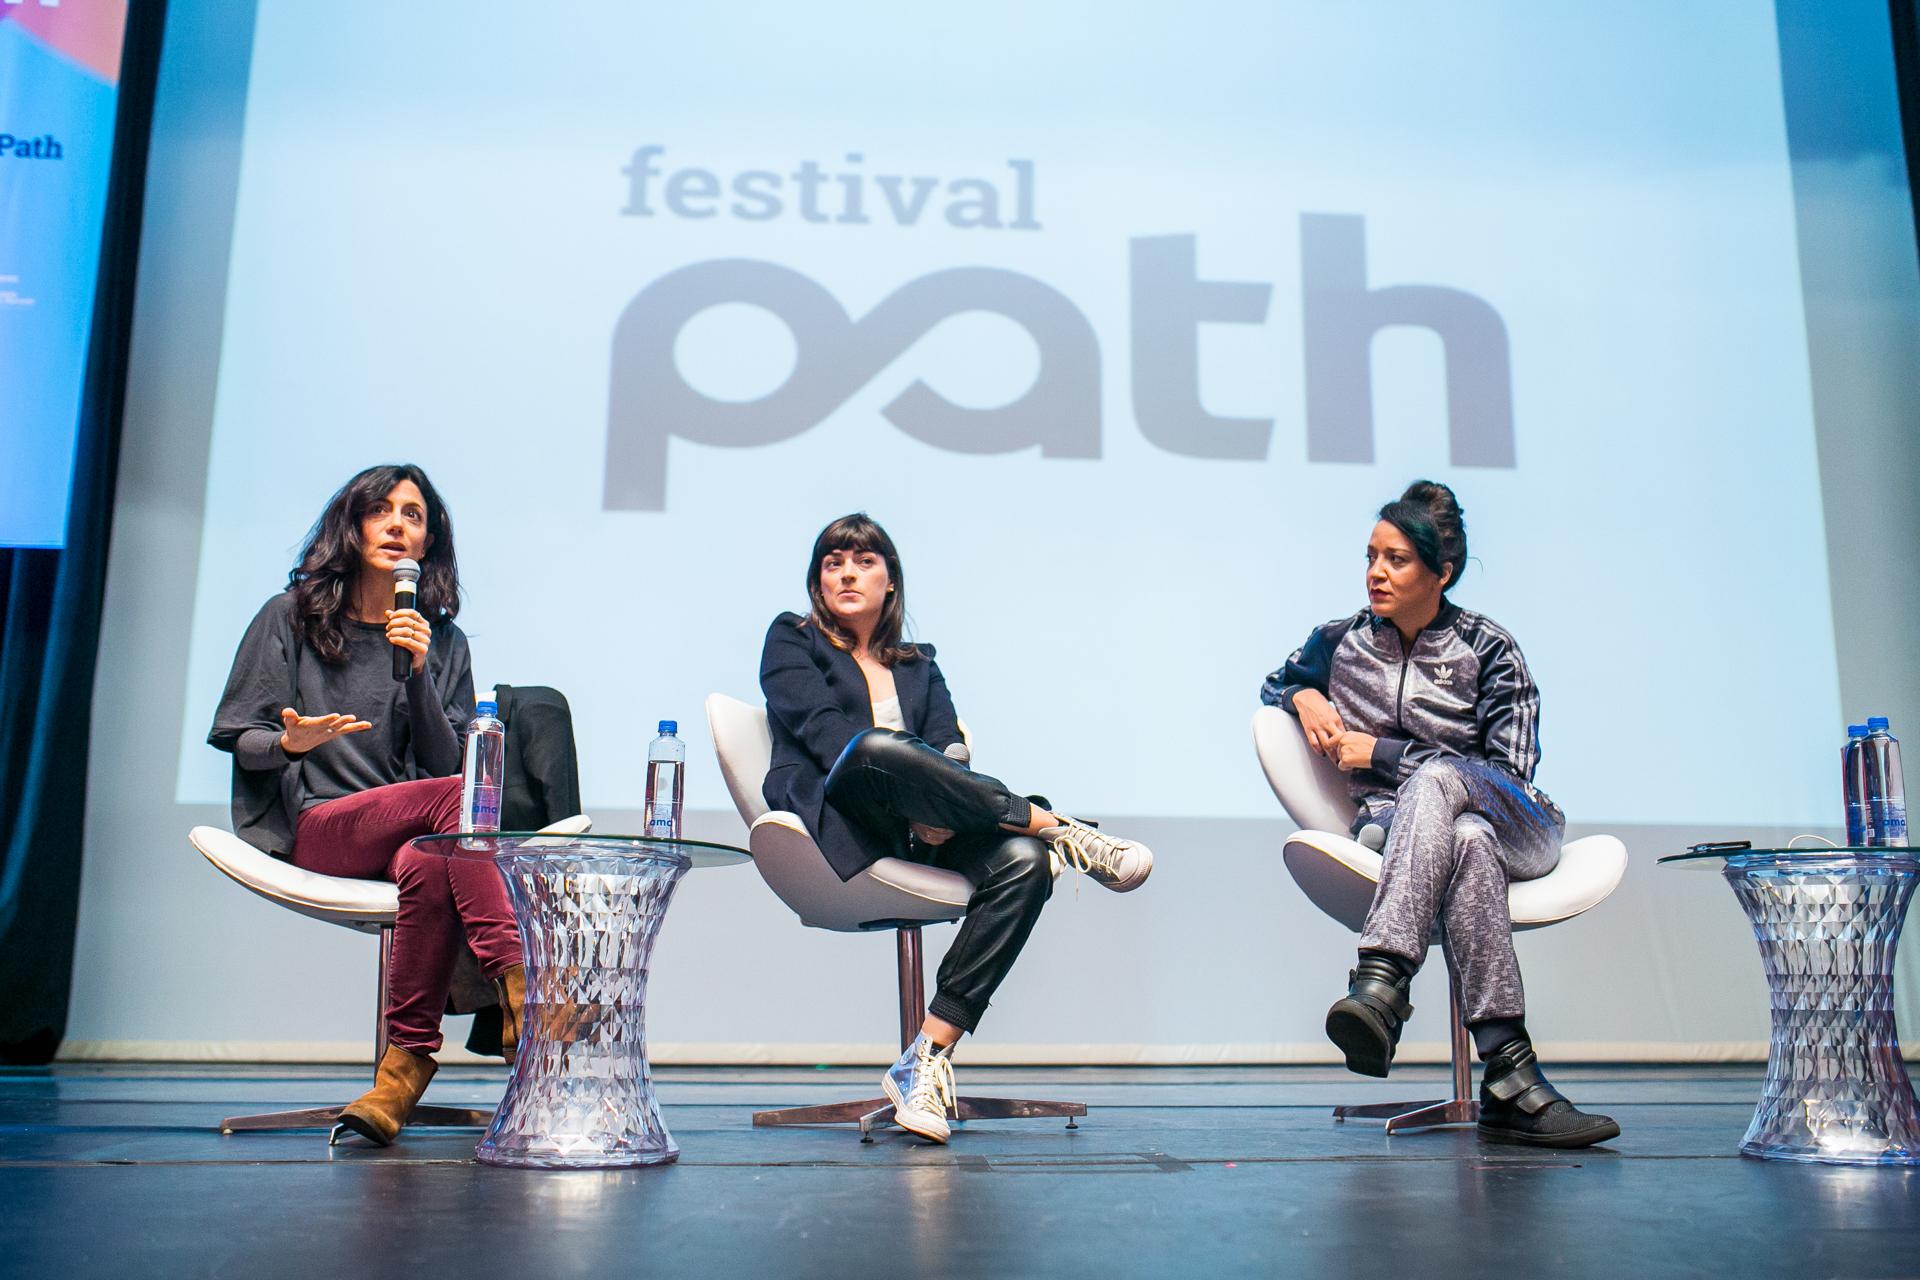 Marina Person, Vera Egito e Roberta Estrela D'Alva falaram sobre o papel da mulher no mercado audiovisual